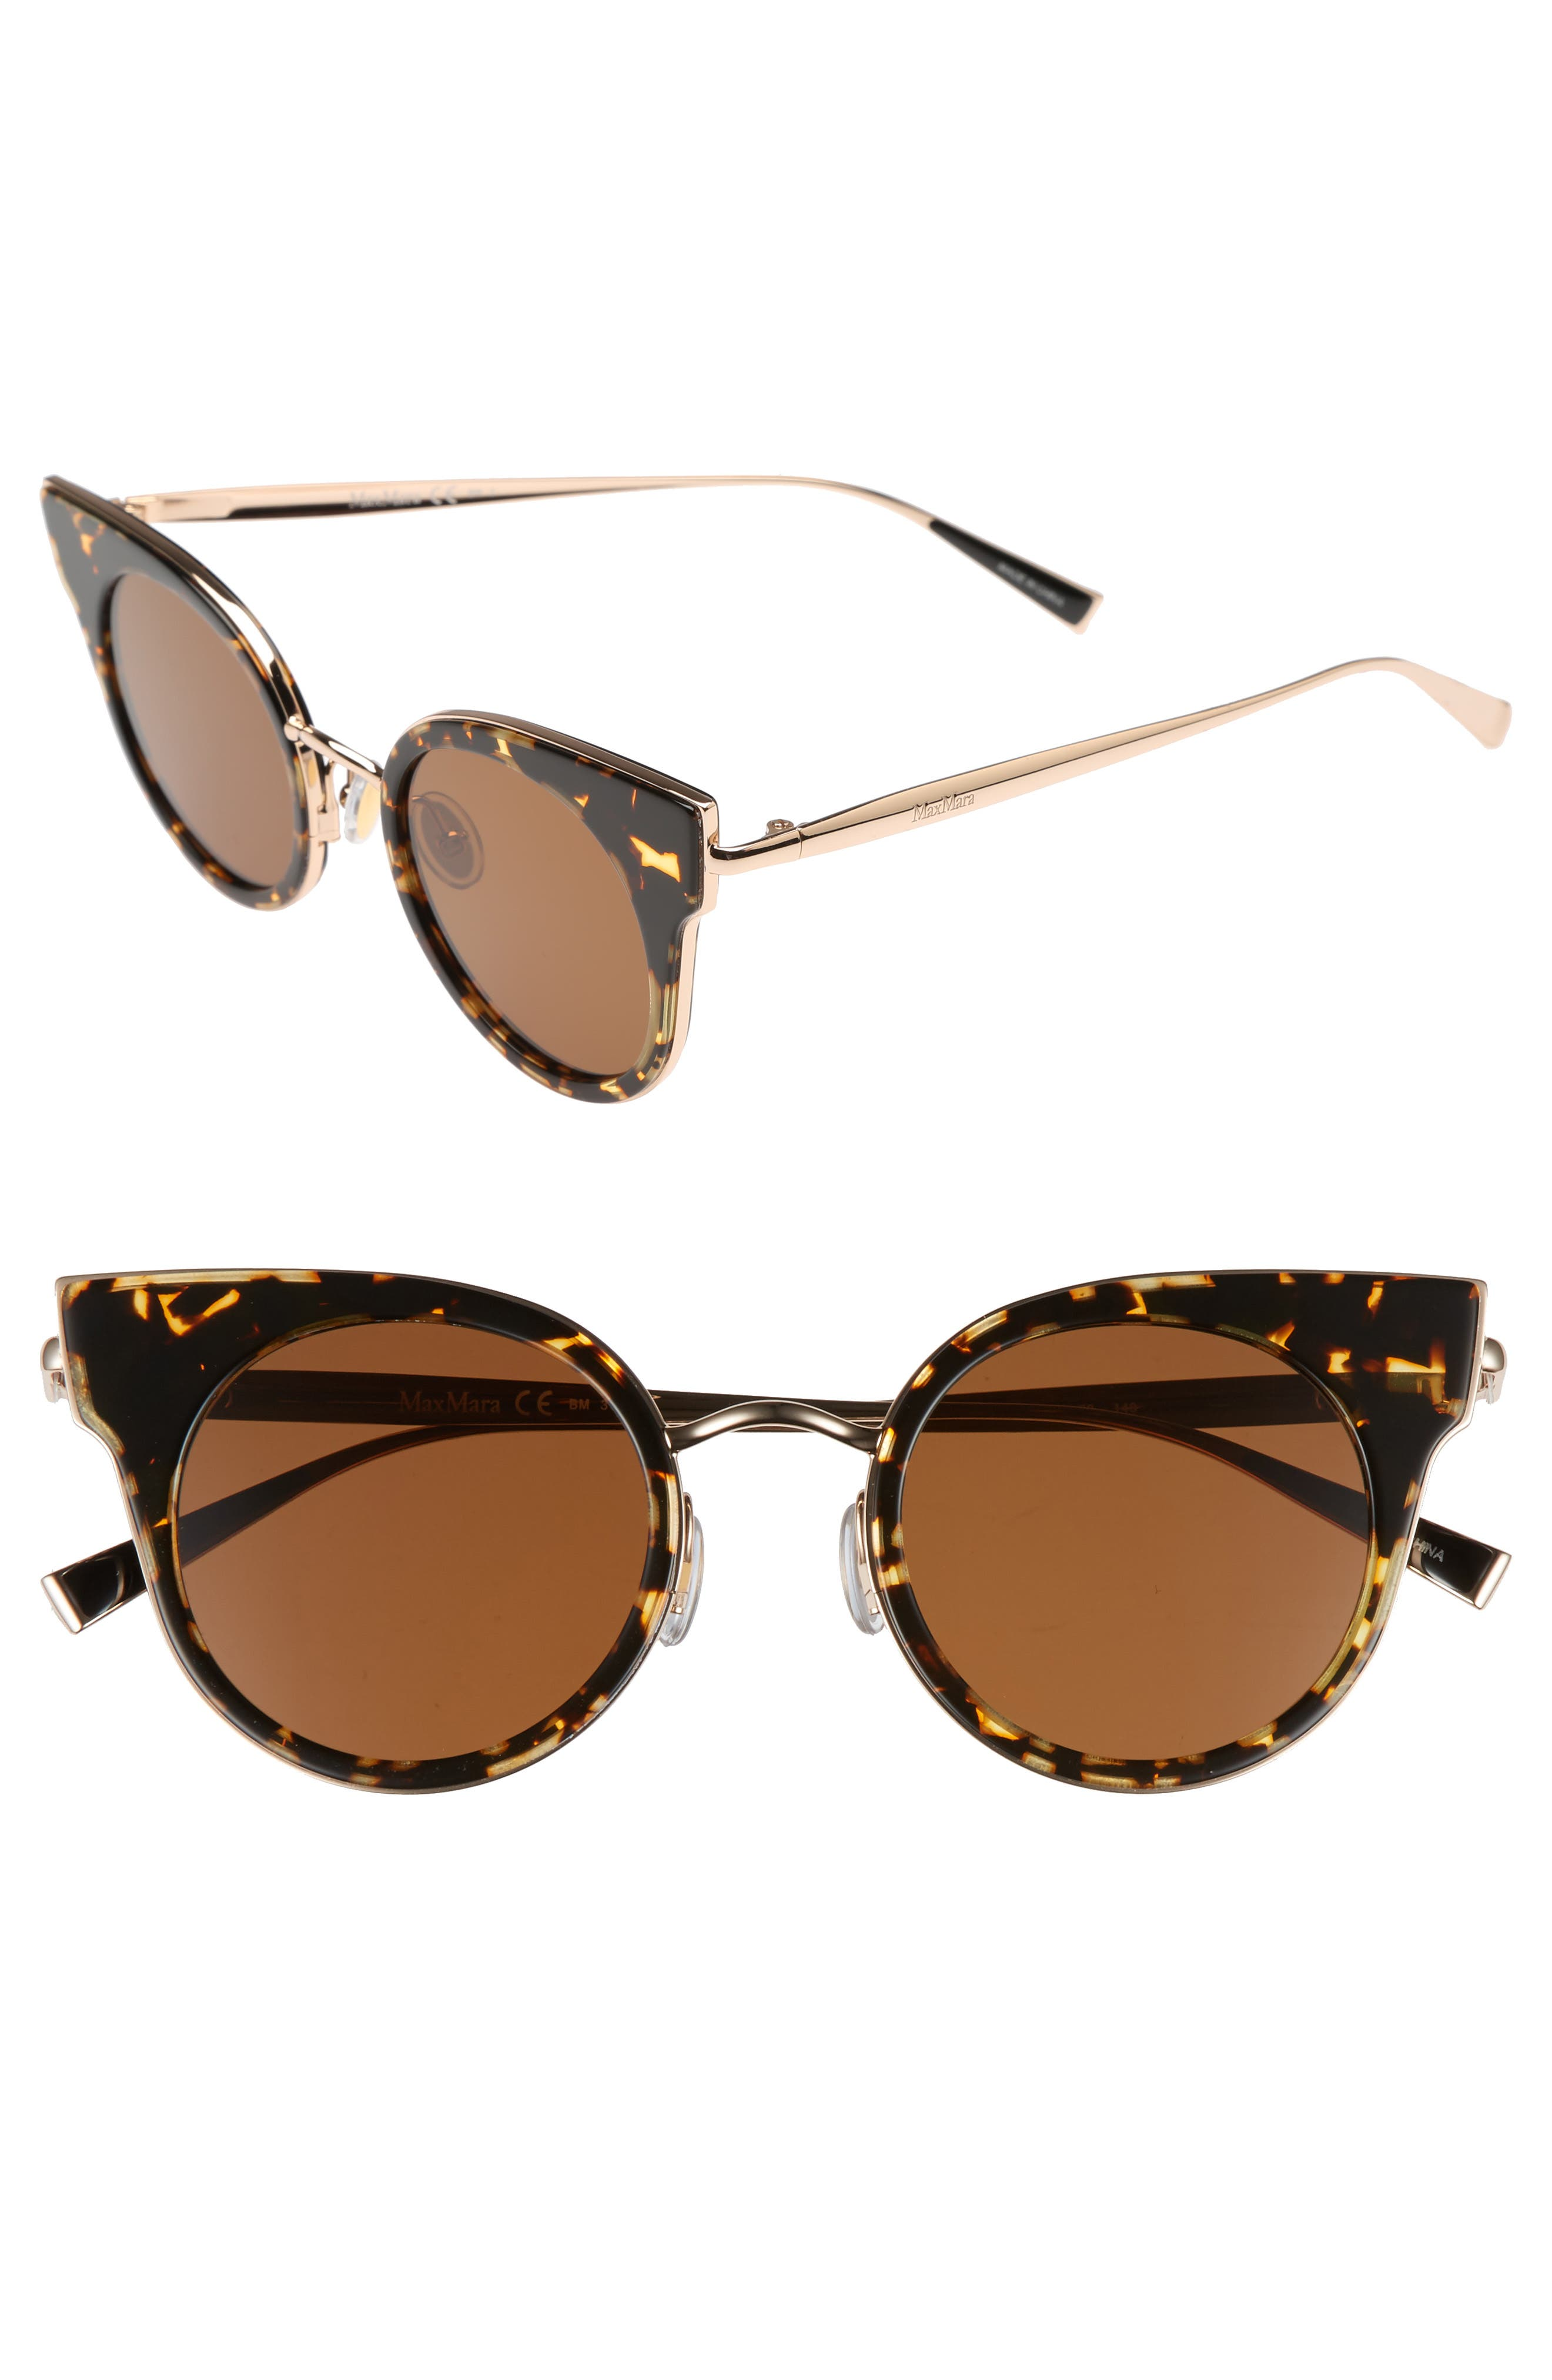 Ilde 46mm Cat Eye Sunglasses,                         Main,                         color, Havana Gold